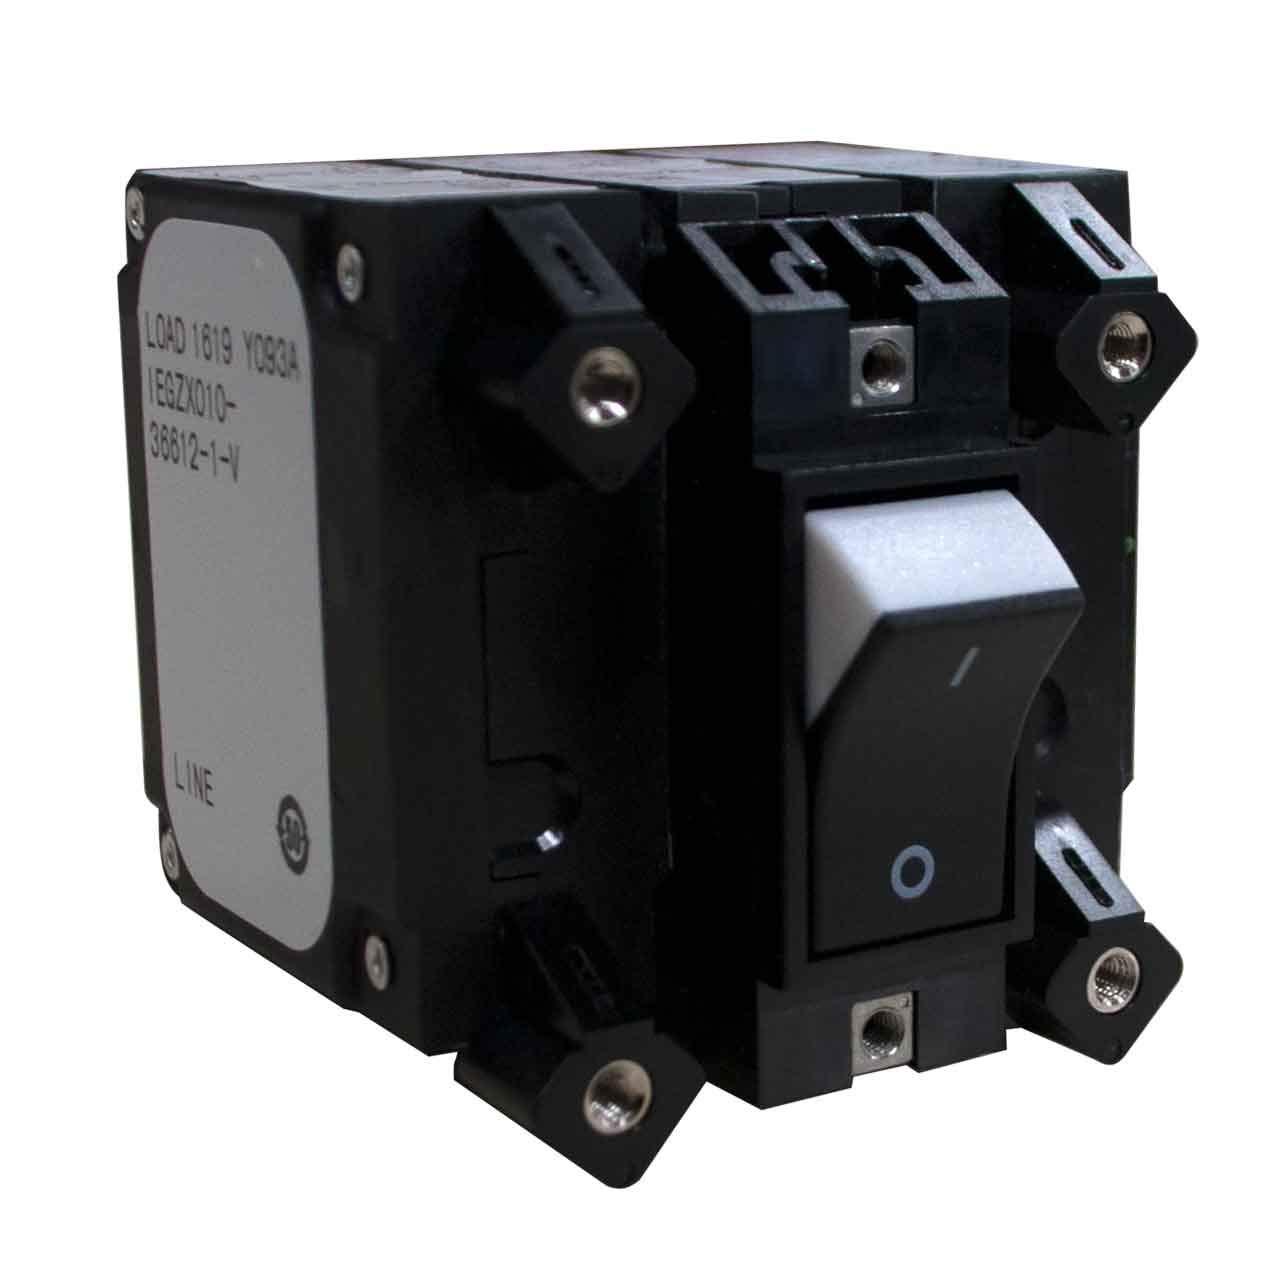 Hypertherm 228266 Kit, PMX45 Power Switch 230V